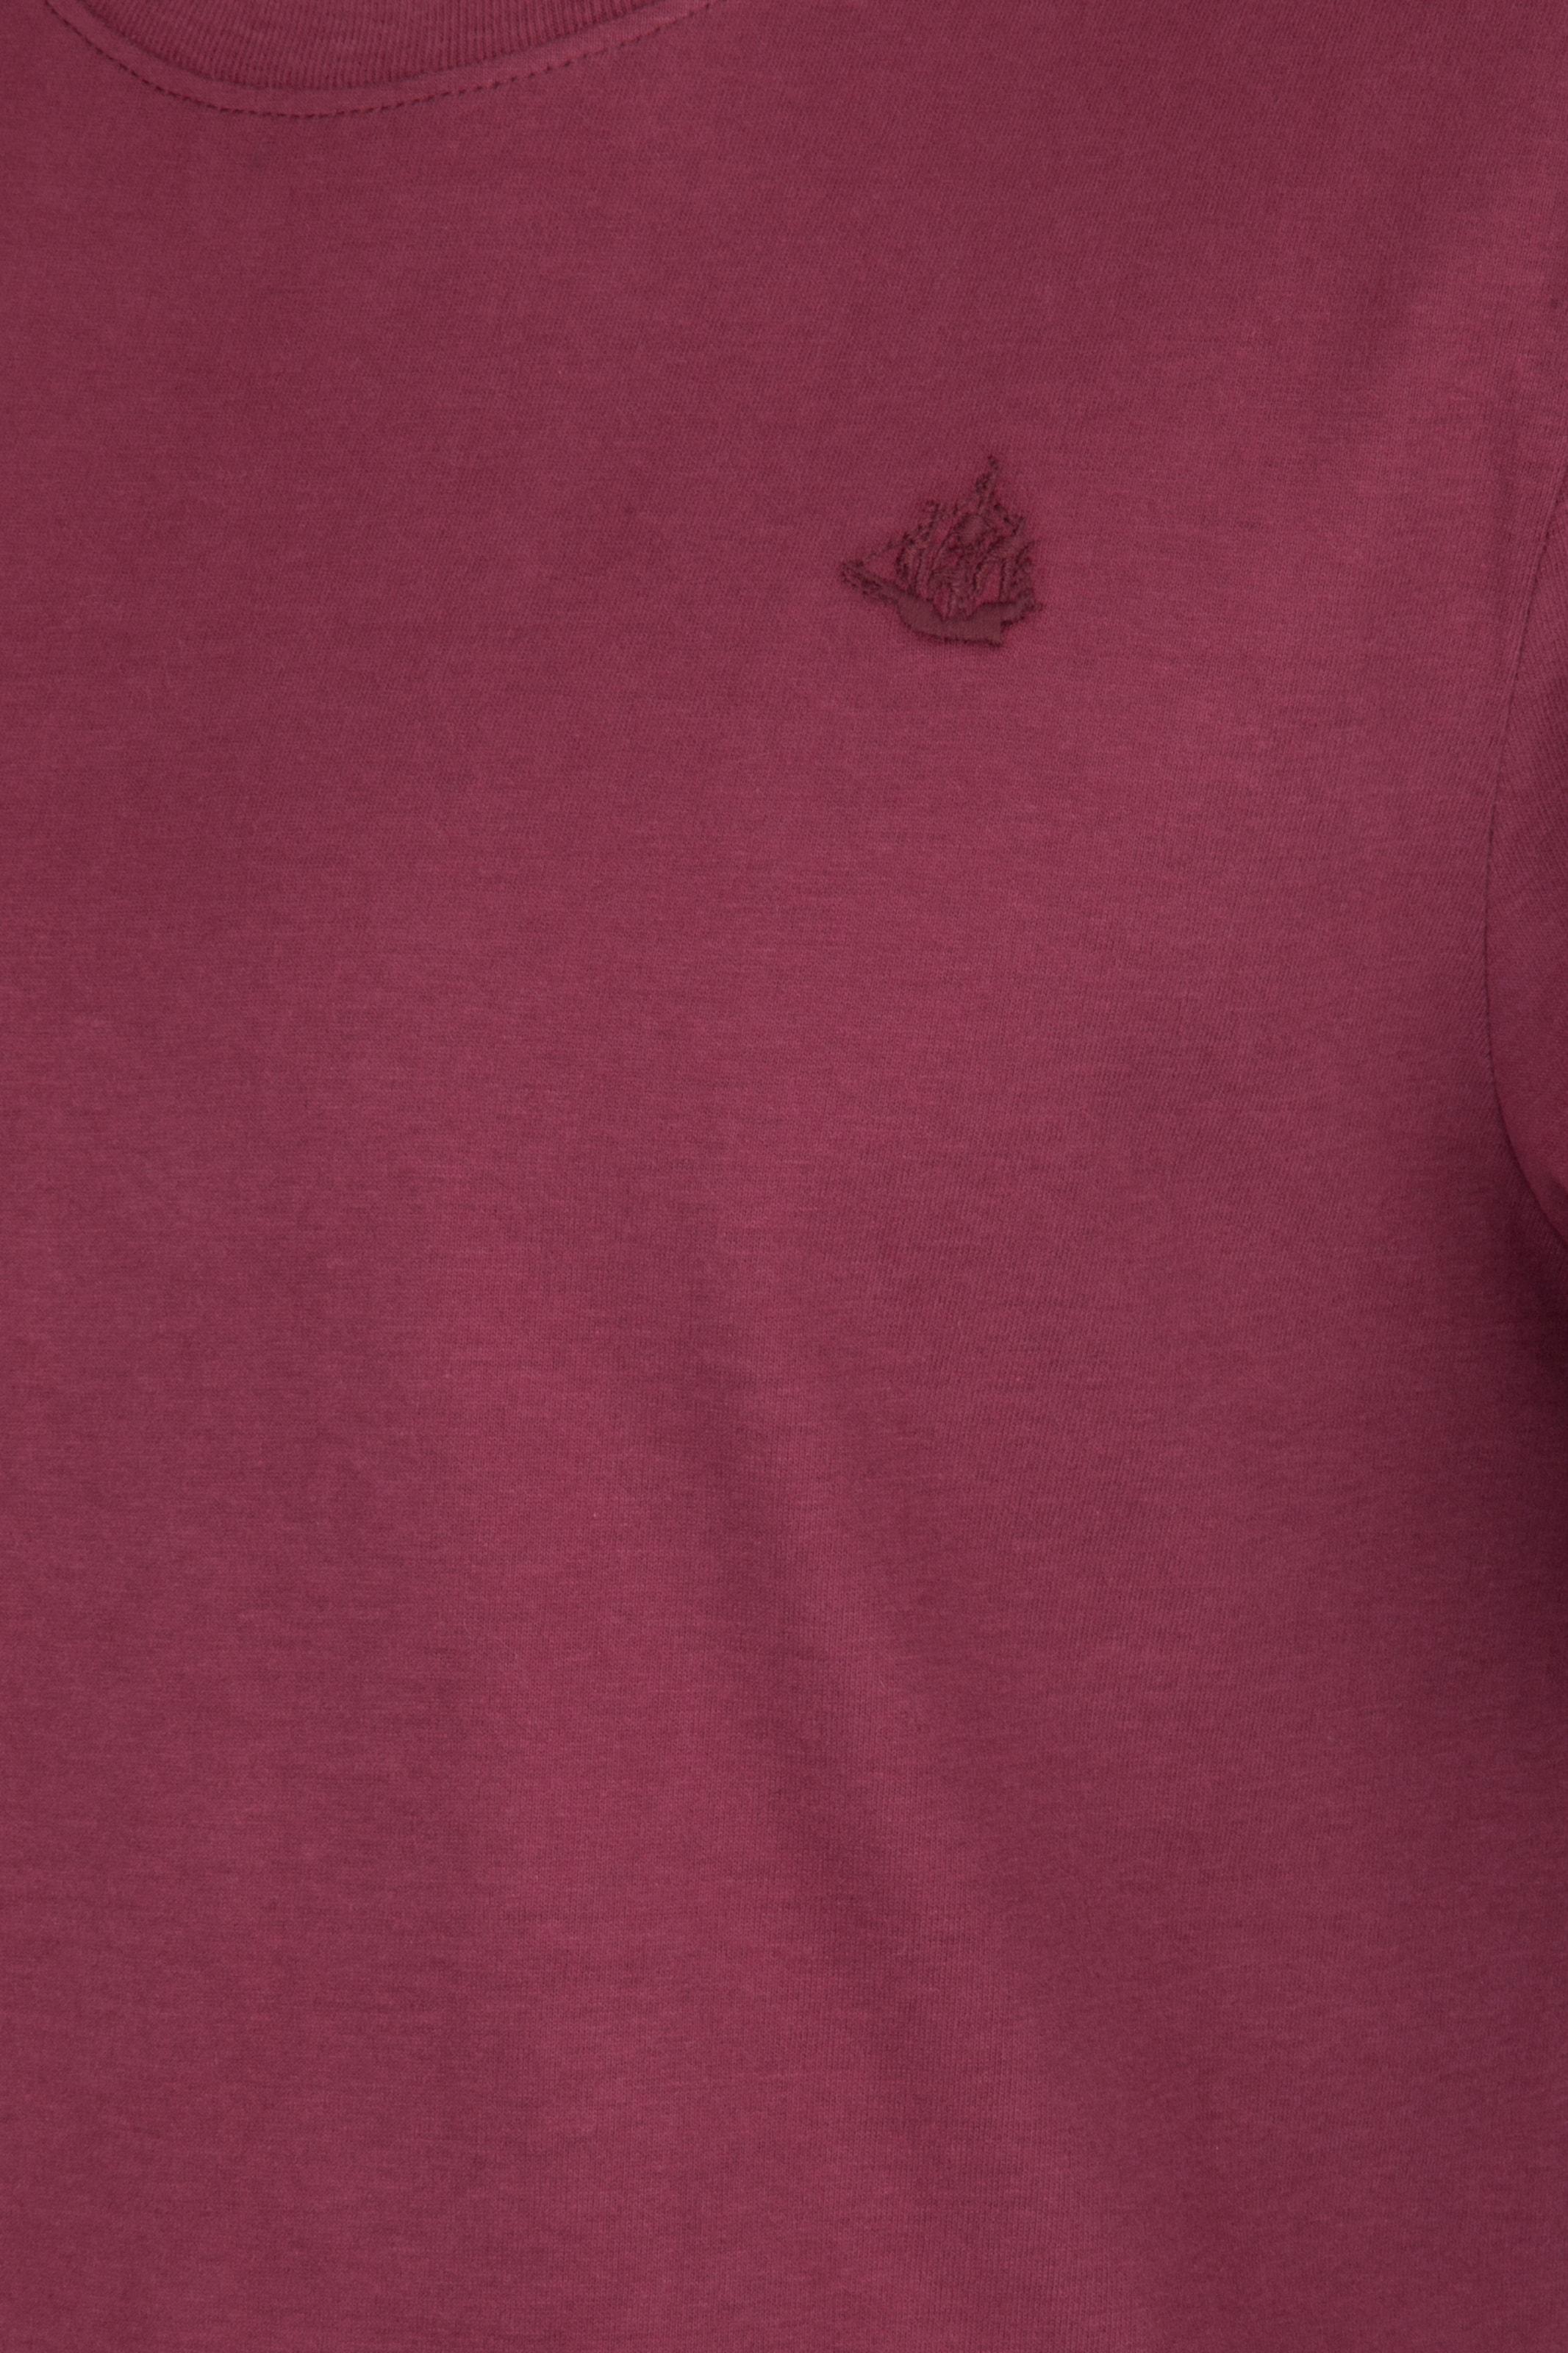 DREIMASTER T-Shirt 2018 Günstig Online u8aDyJHb9a